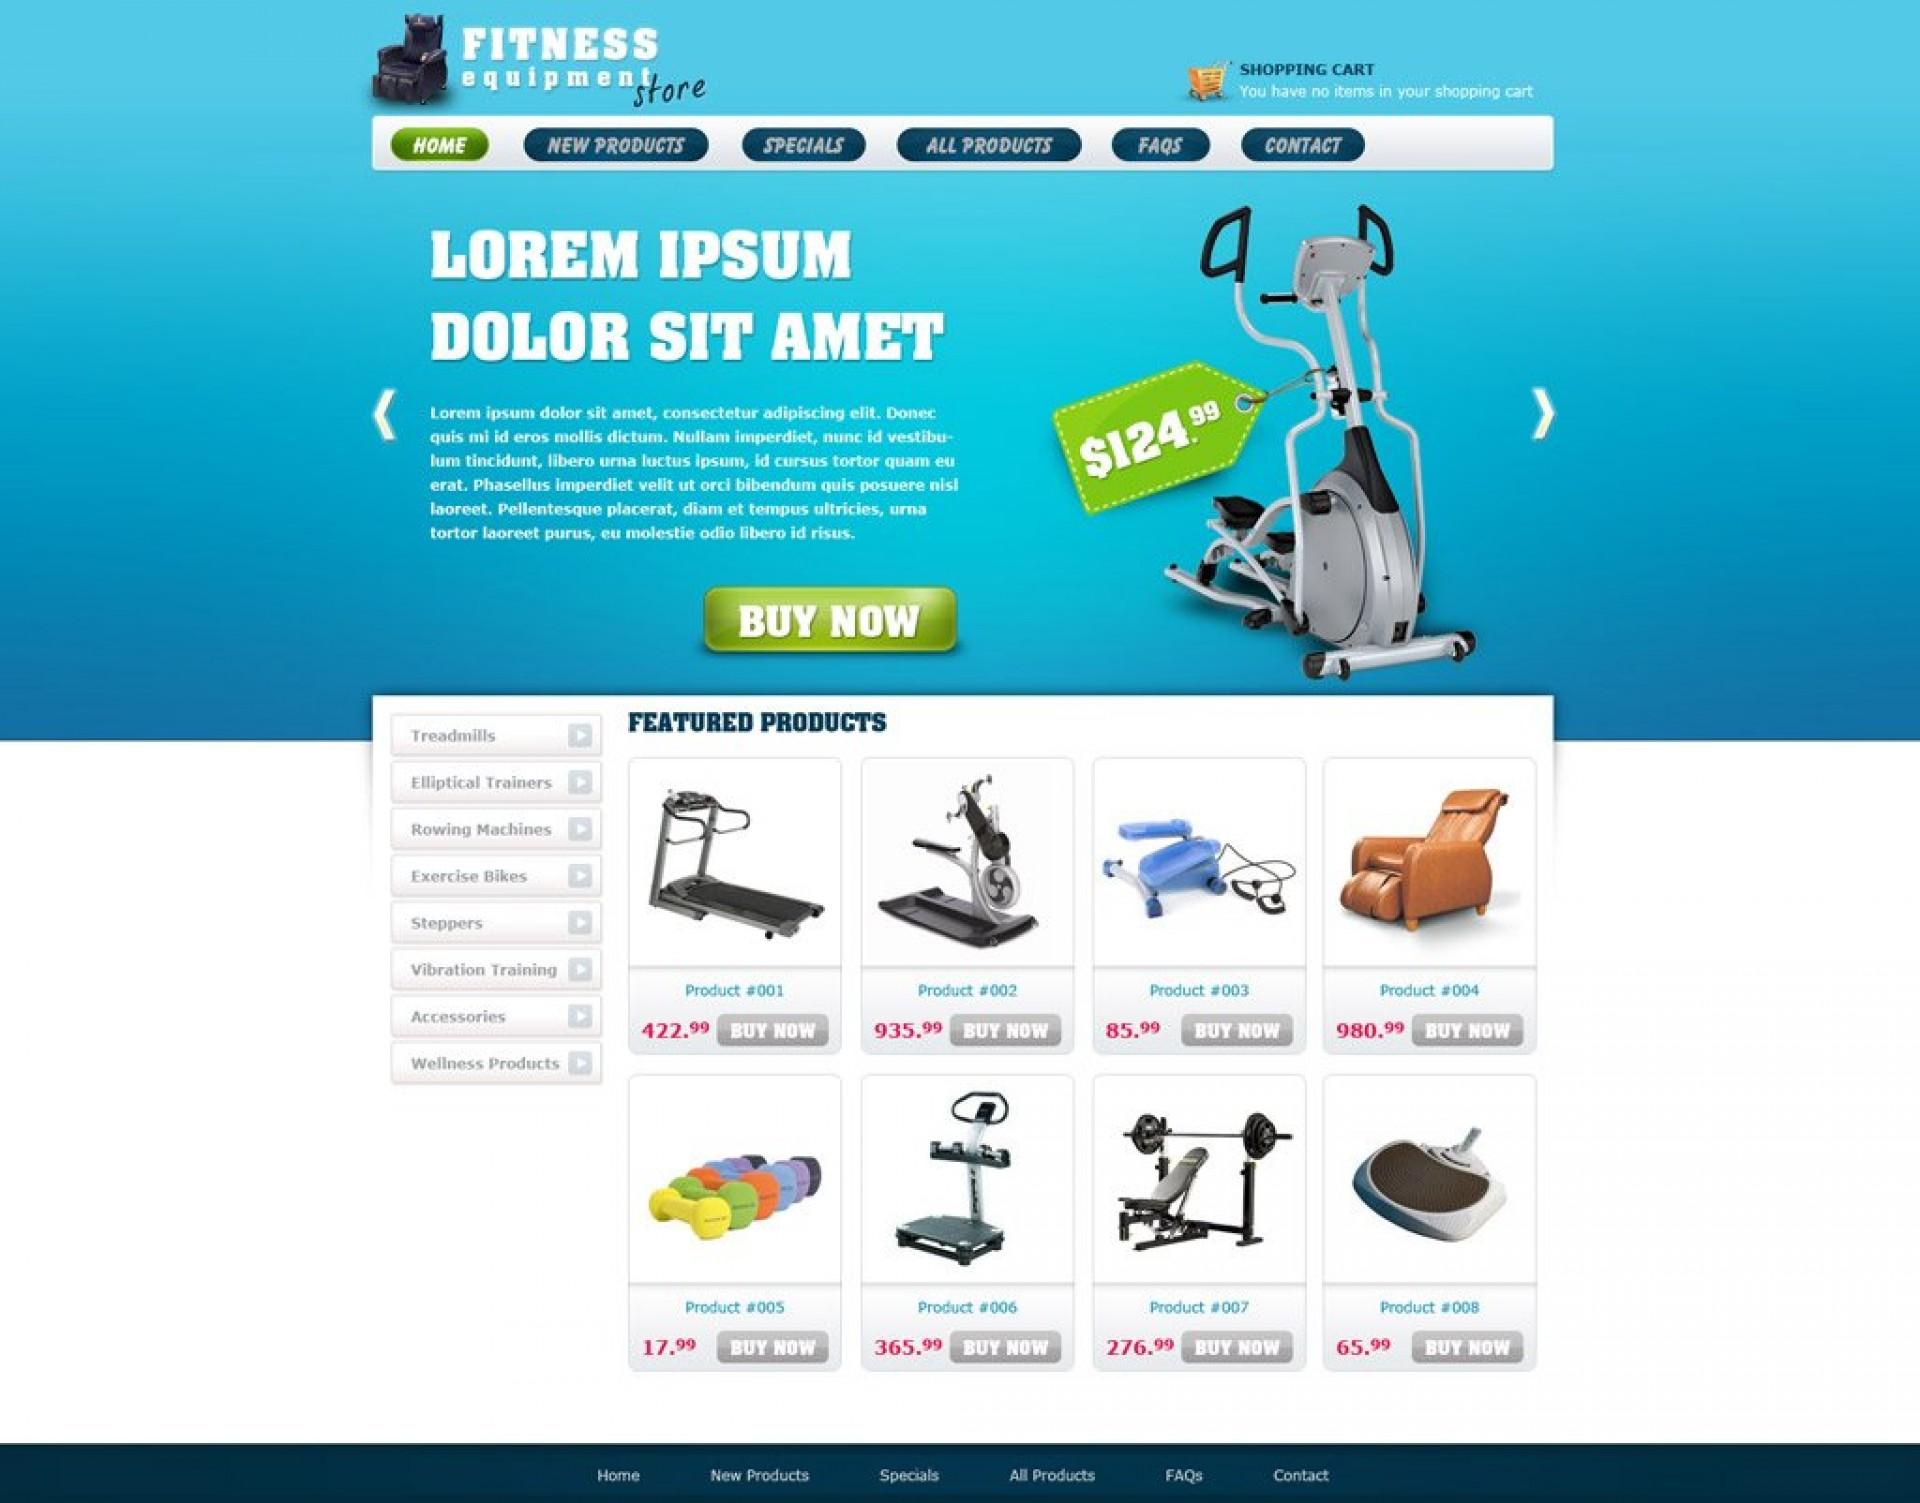 010 Singular Free E Commerce Website Template Image  Ecommerce Html Cs Bootstrap Php1920